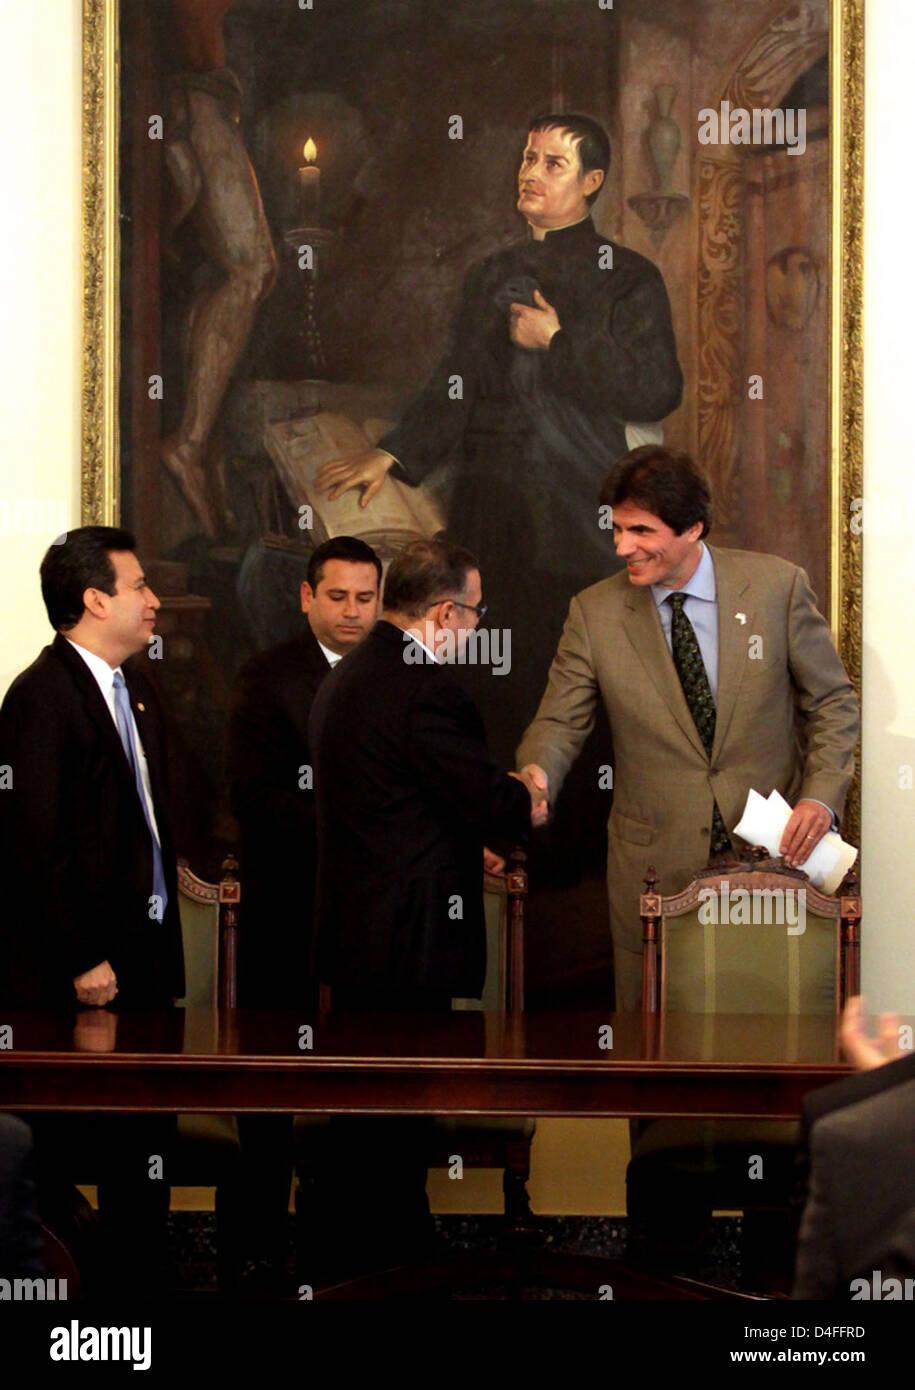 Assistant Secretary Fernandez Shakes Hands With Salvadoran President Funes - Stock Image